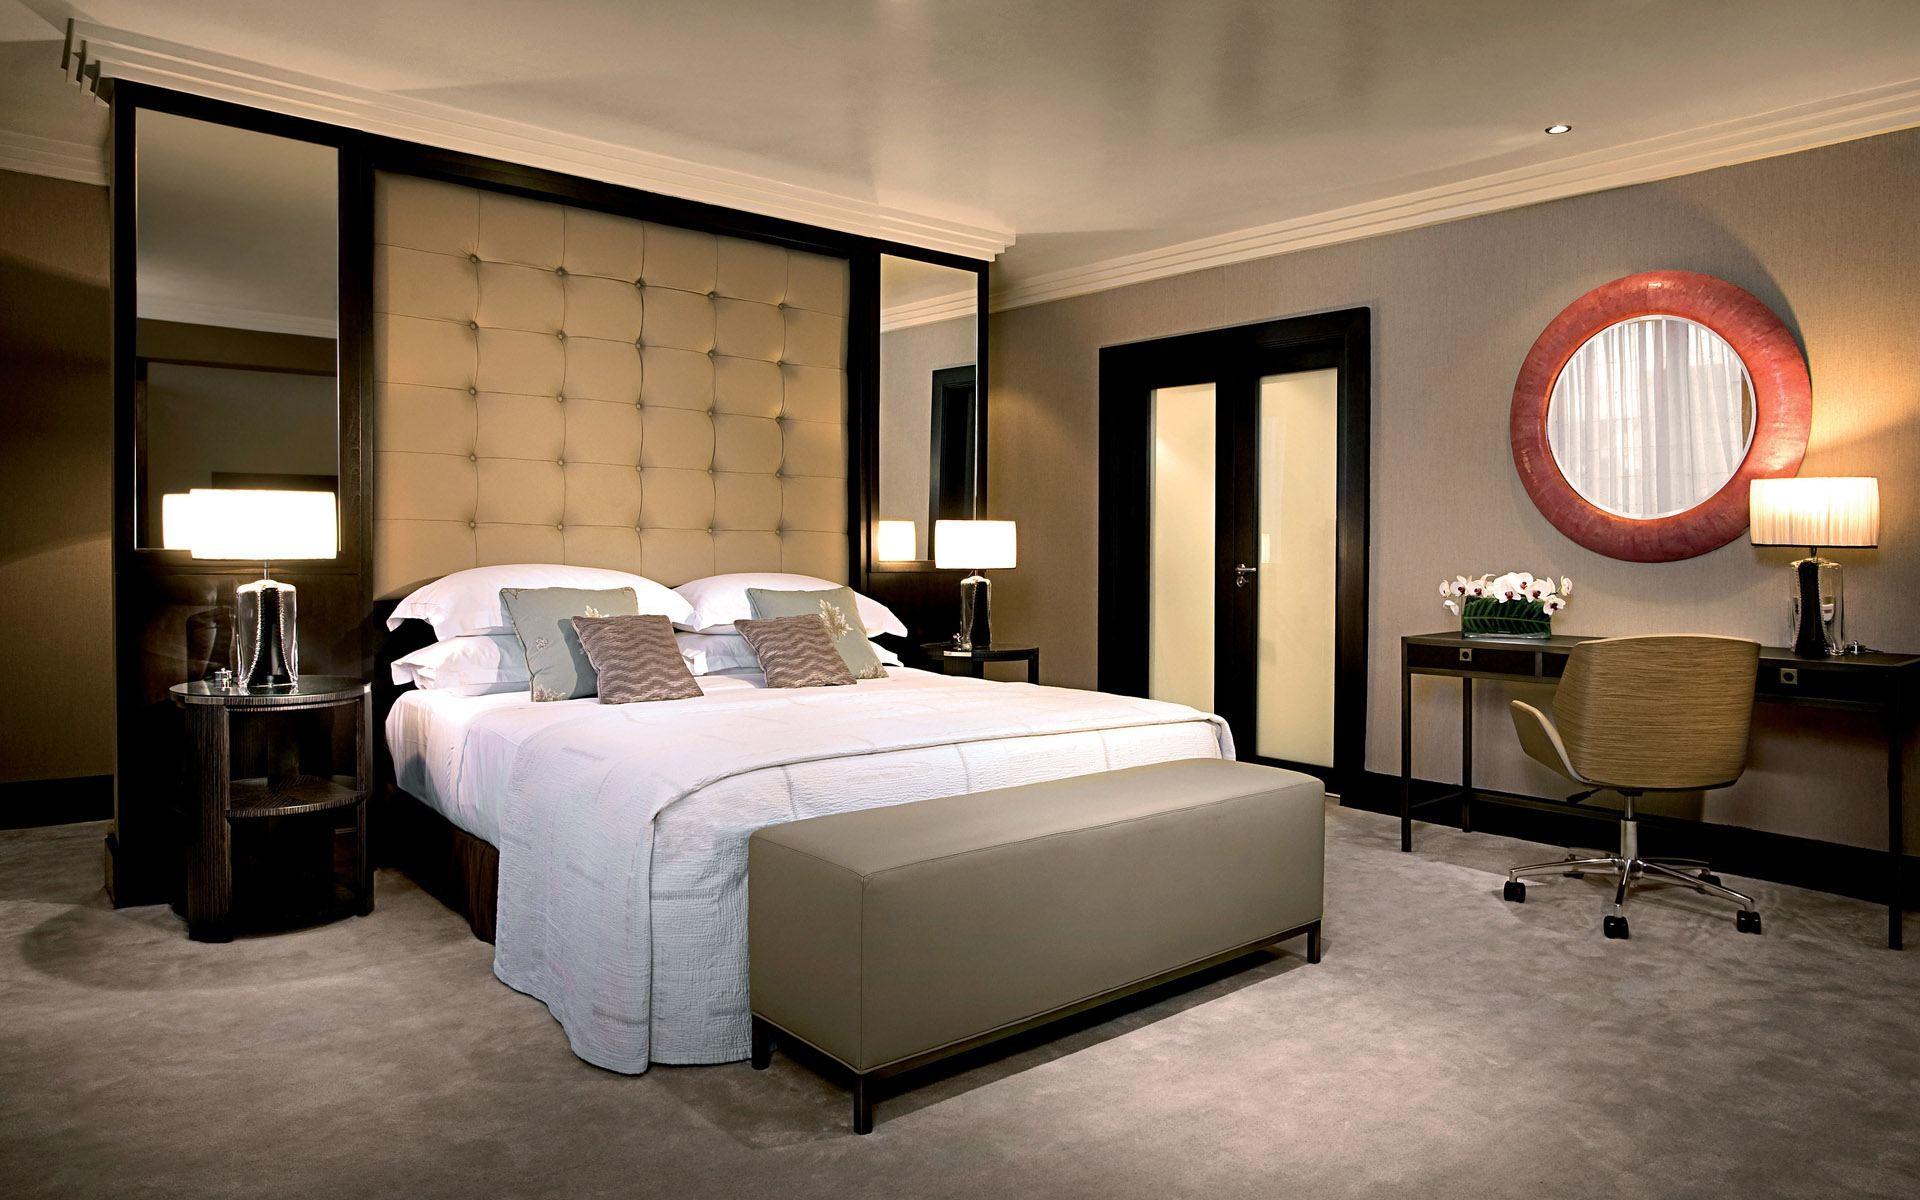 Lovable Girl Wallpaper Pink Fur Wallpaper For Bedrooms 183 ① Wallpapertag